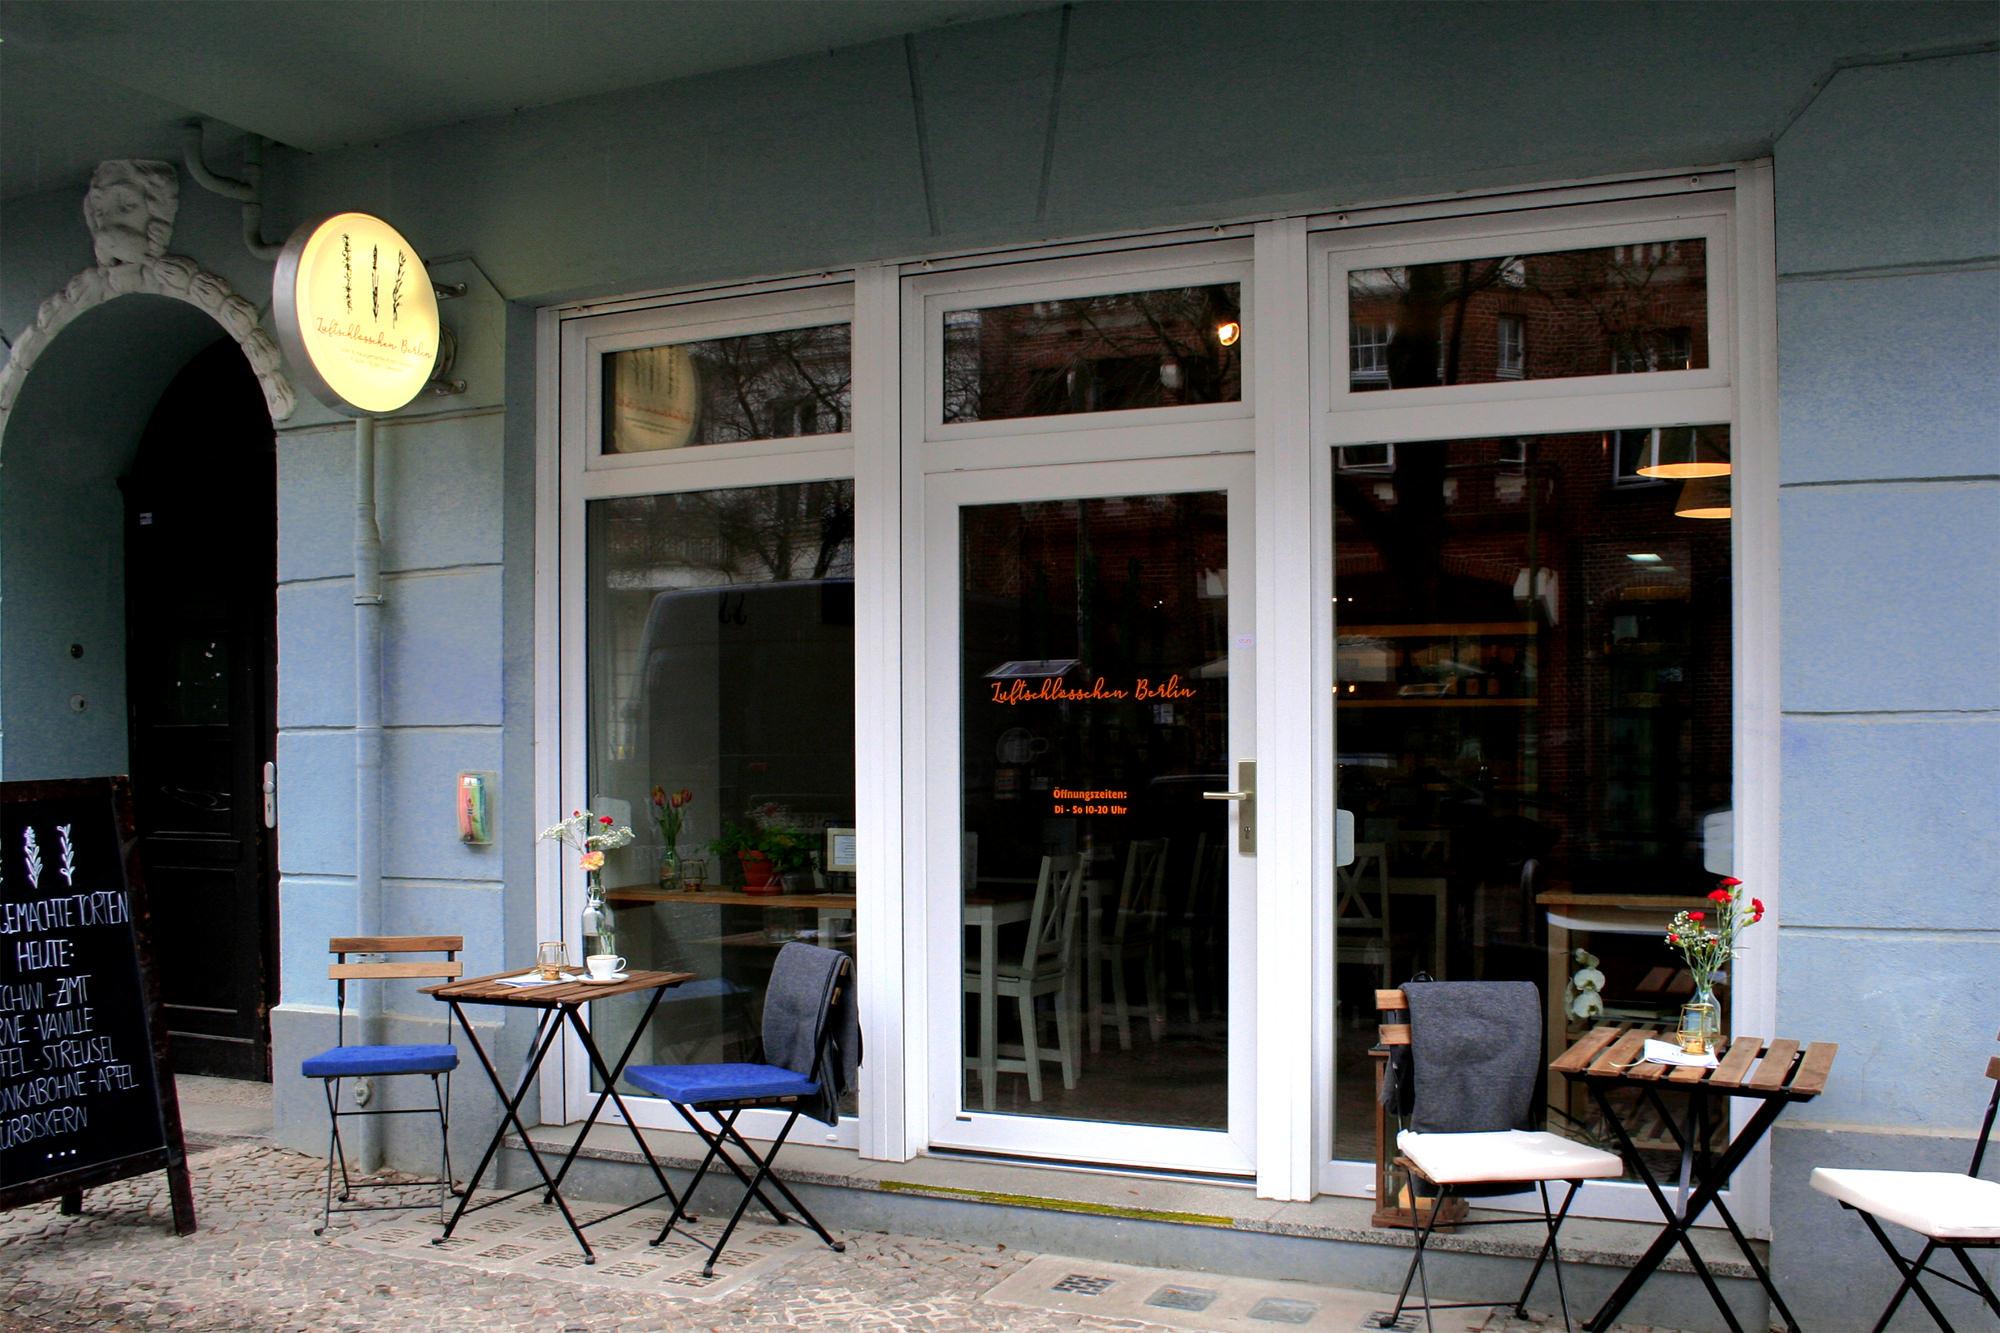 Luftschloesschen_Berlin_Cafe_Prenzlauer_Berg.jpg